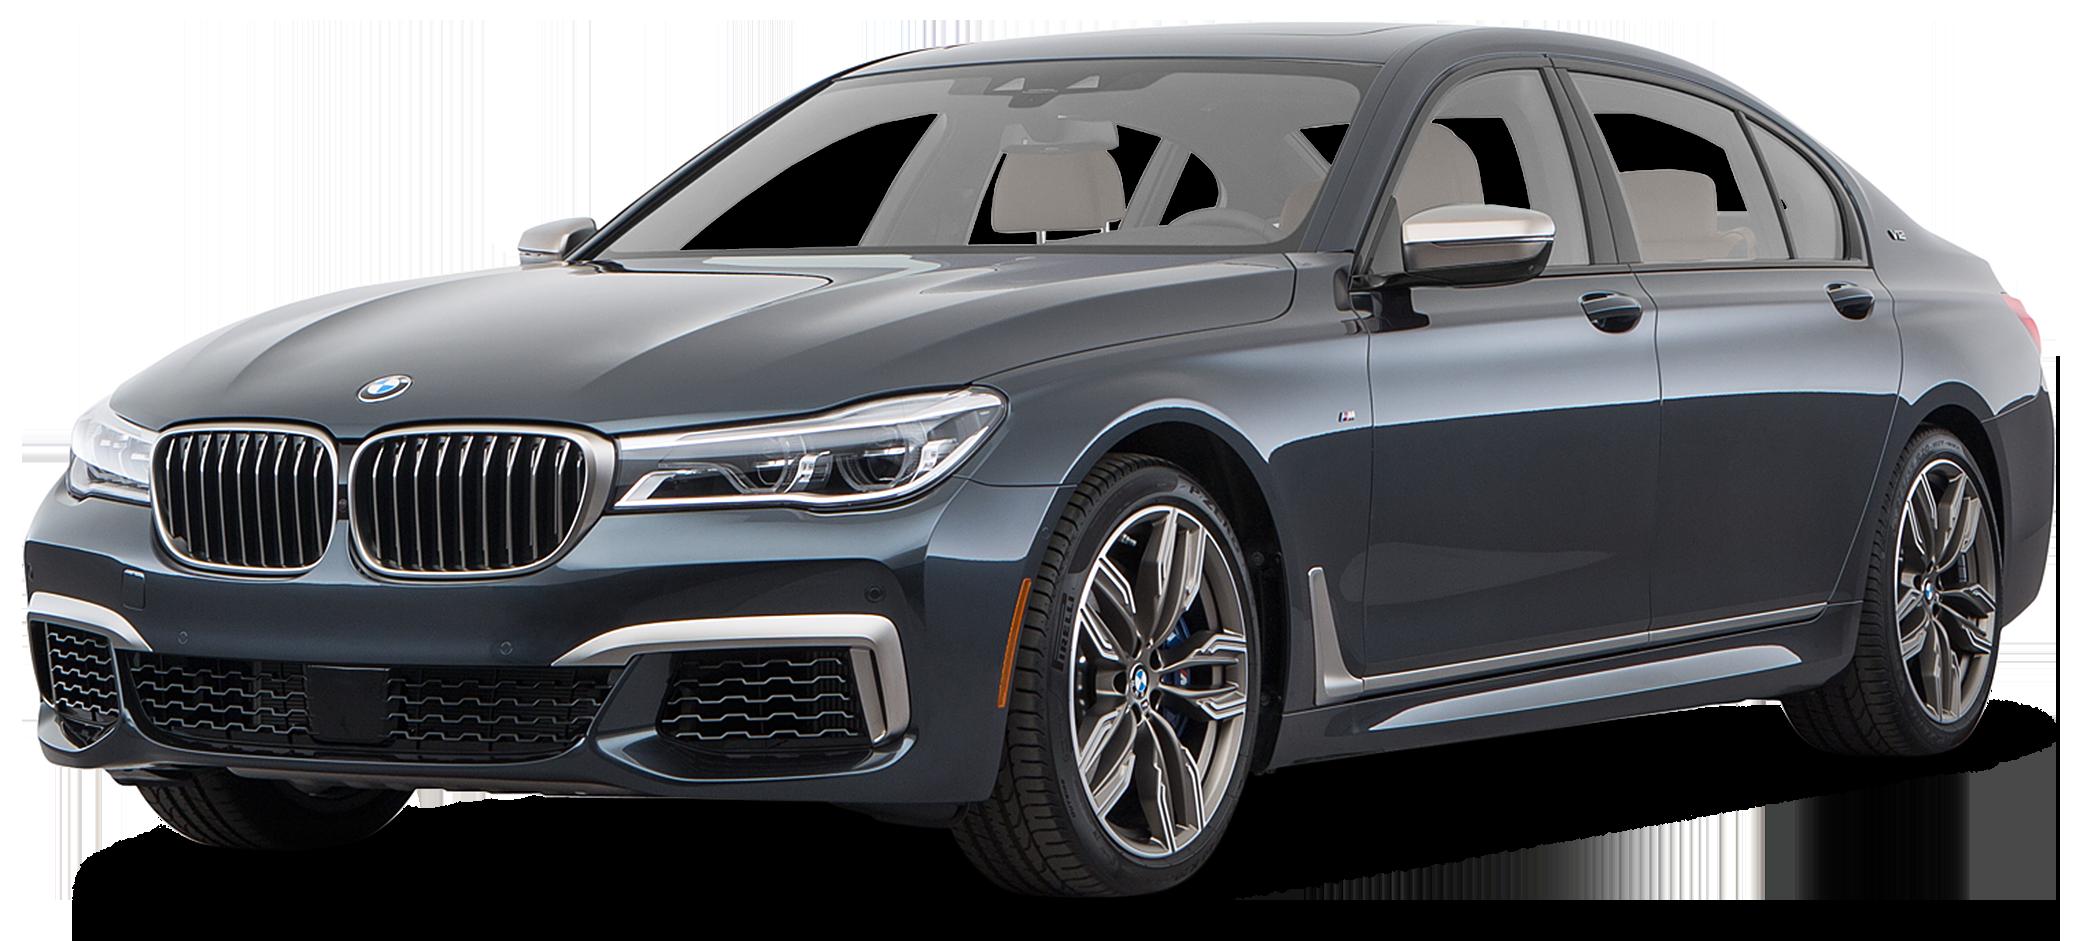 2019 BMW M760i Sedan